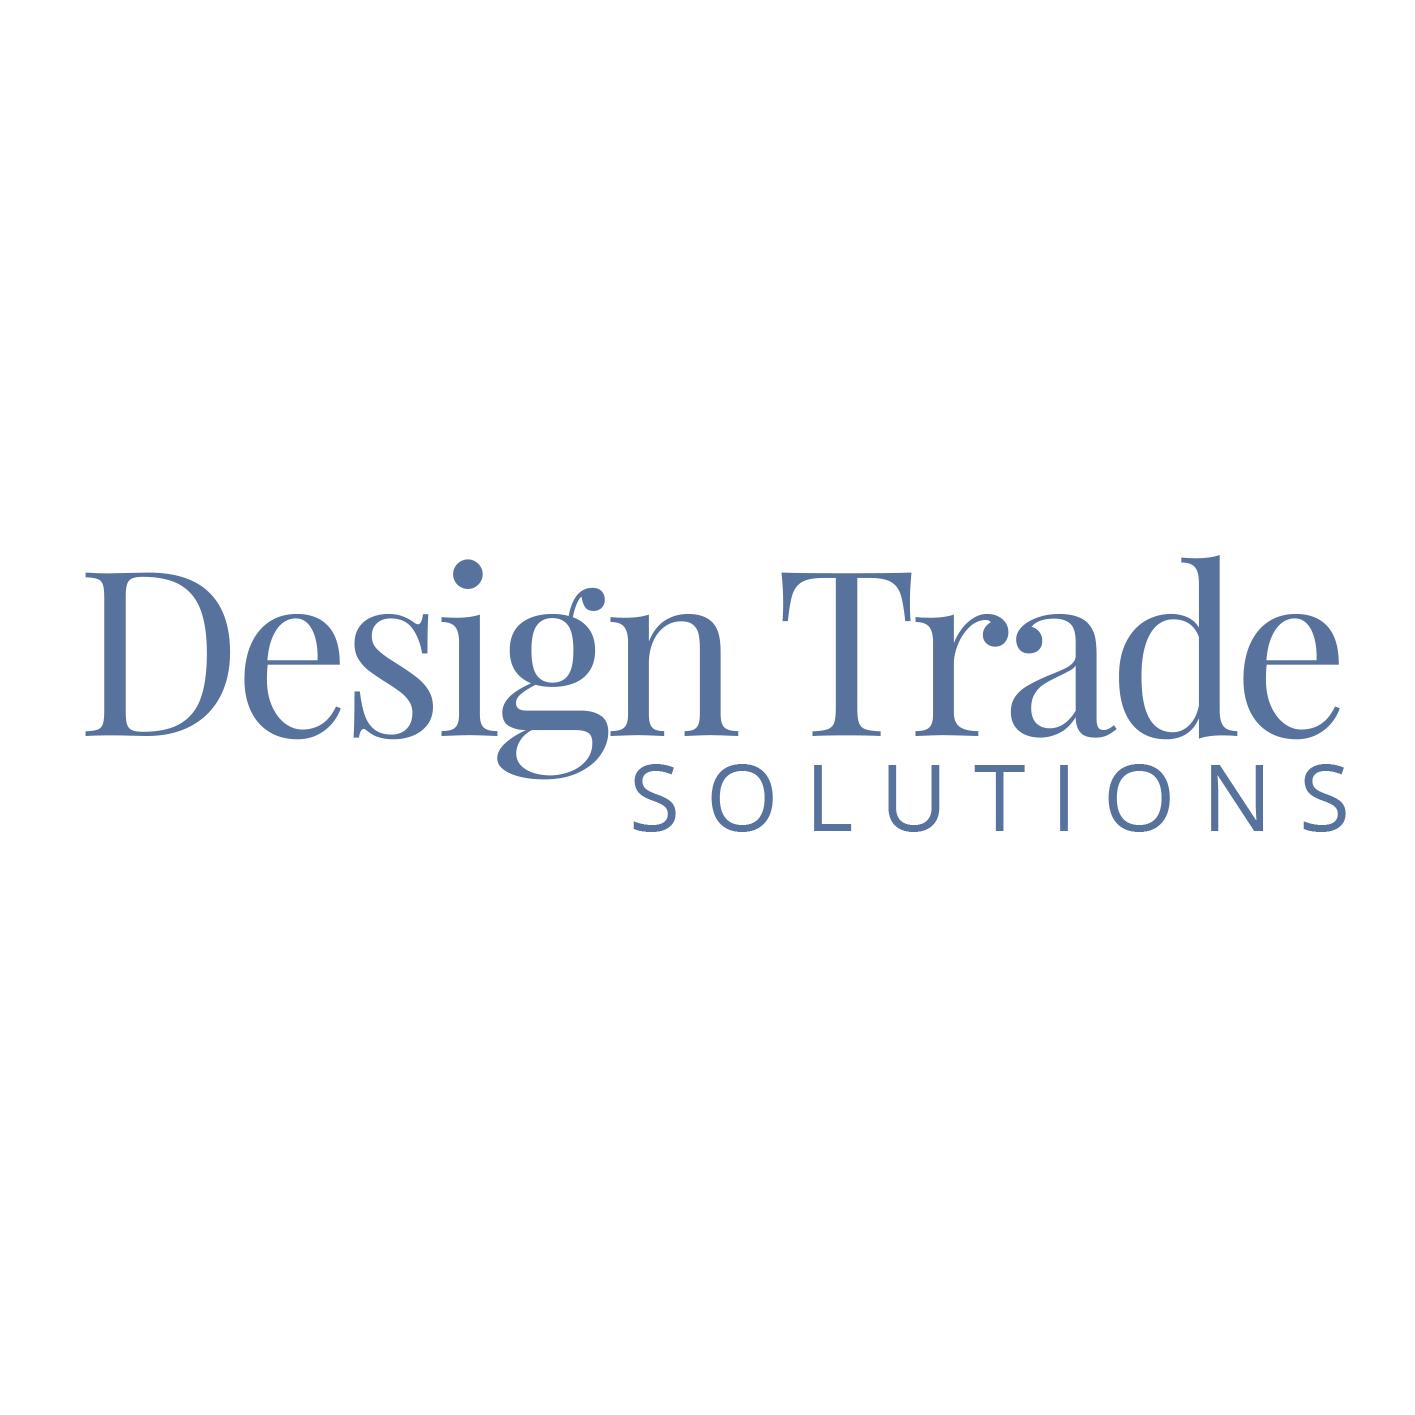 Design Trade Solutions - Grand Rapids, MI - Home Accessories Stores